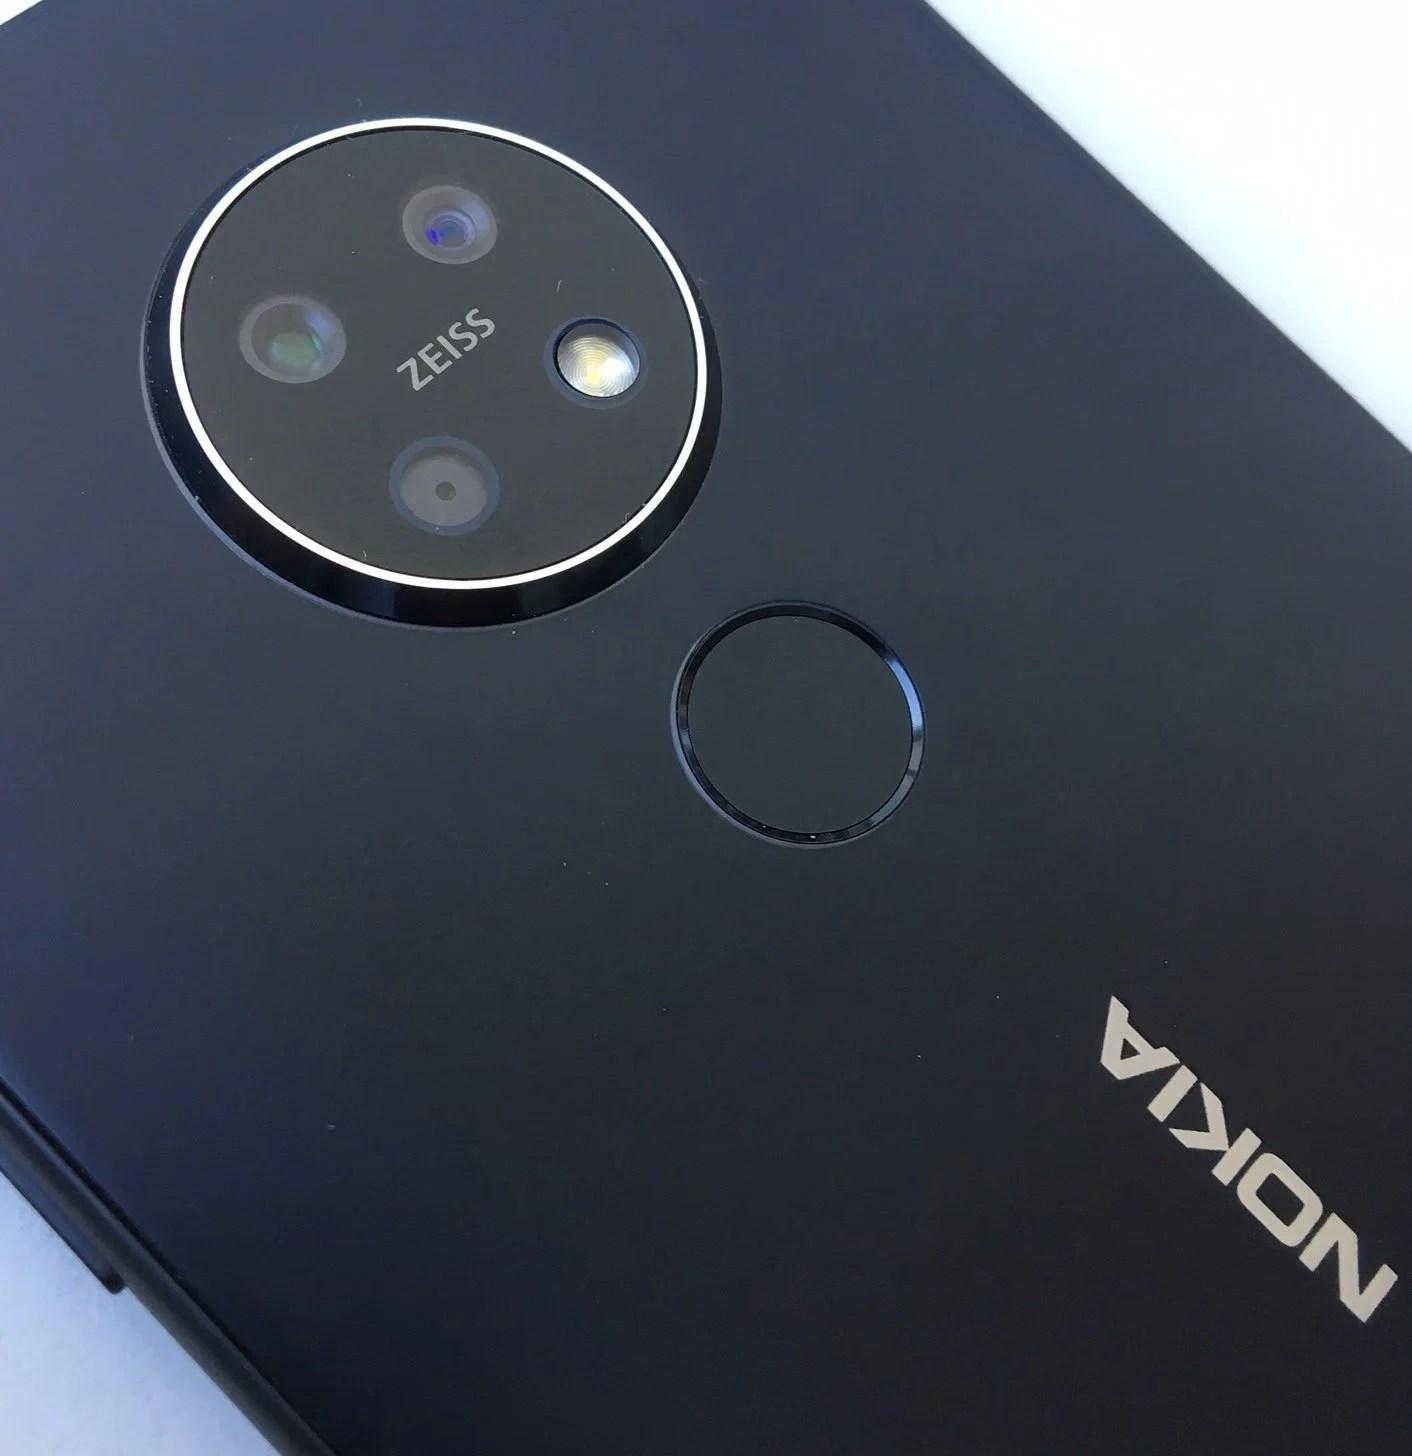 Nokia 7.2 : un partenaire de la marque dévoile le smartphone en avance